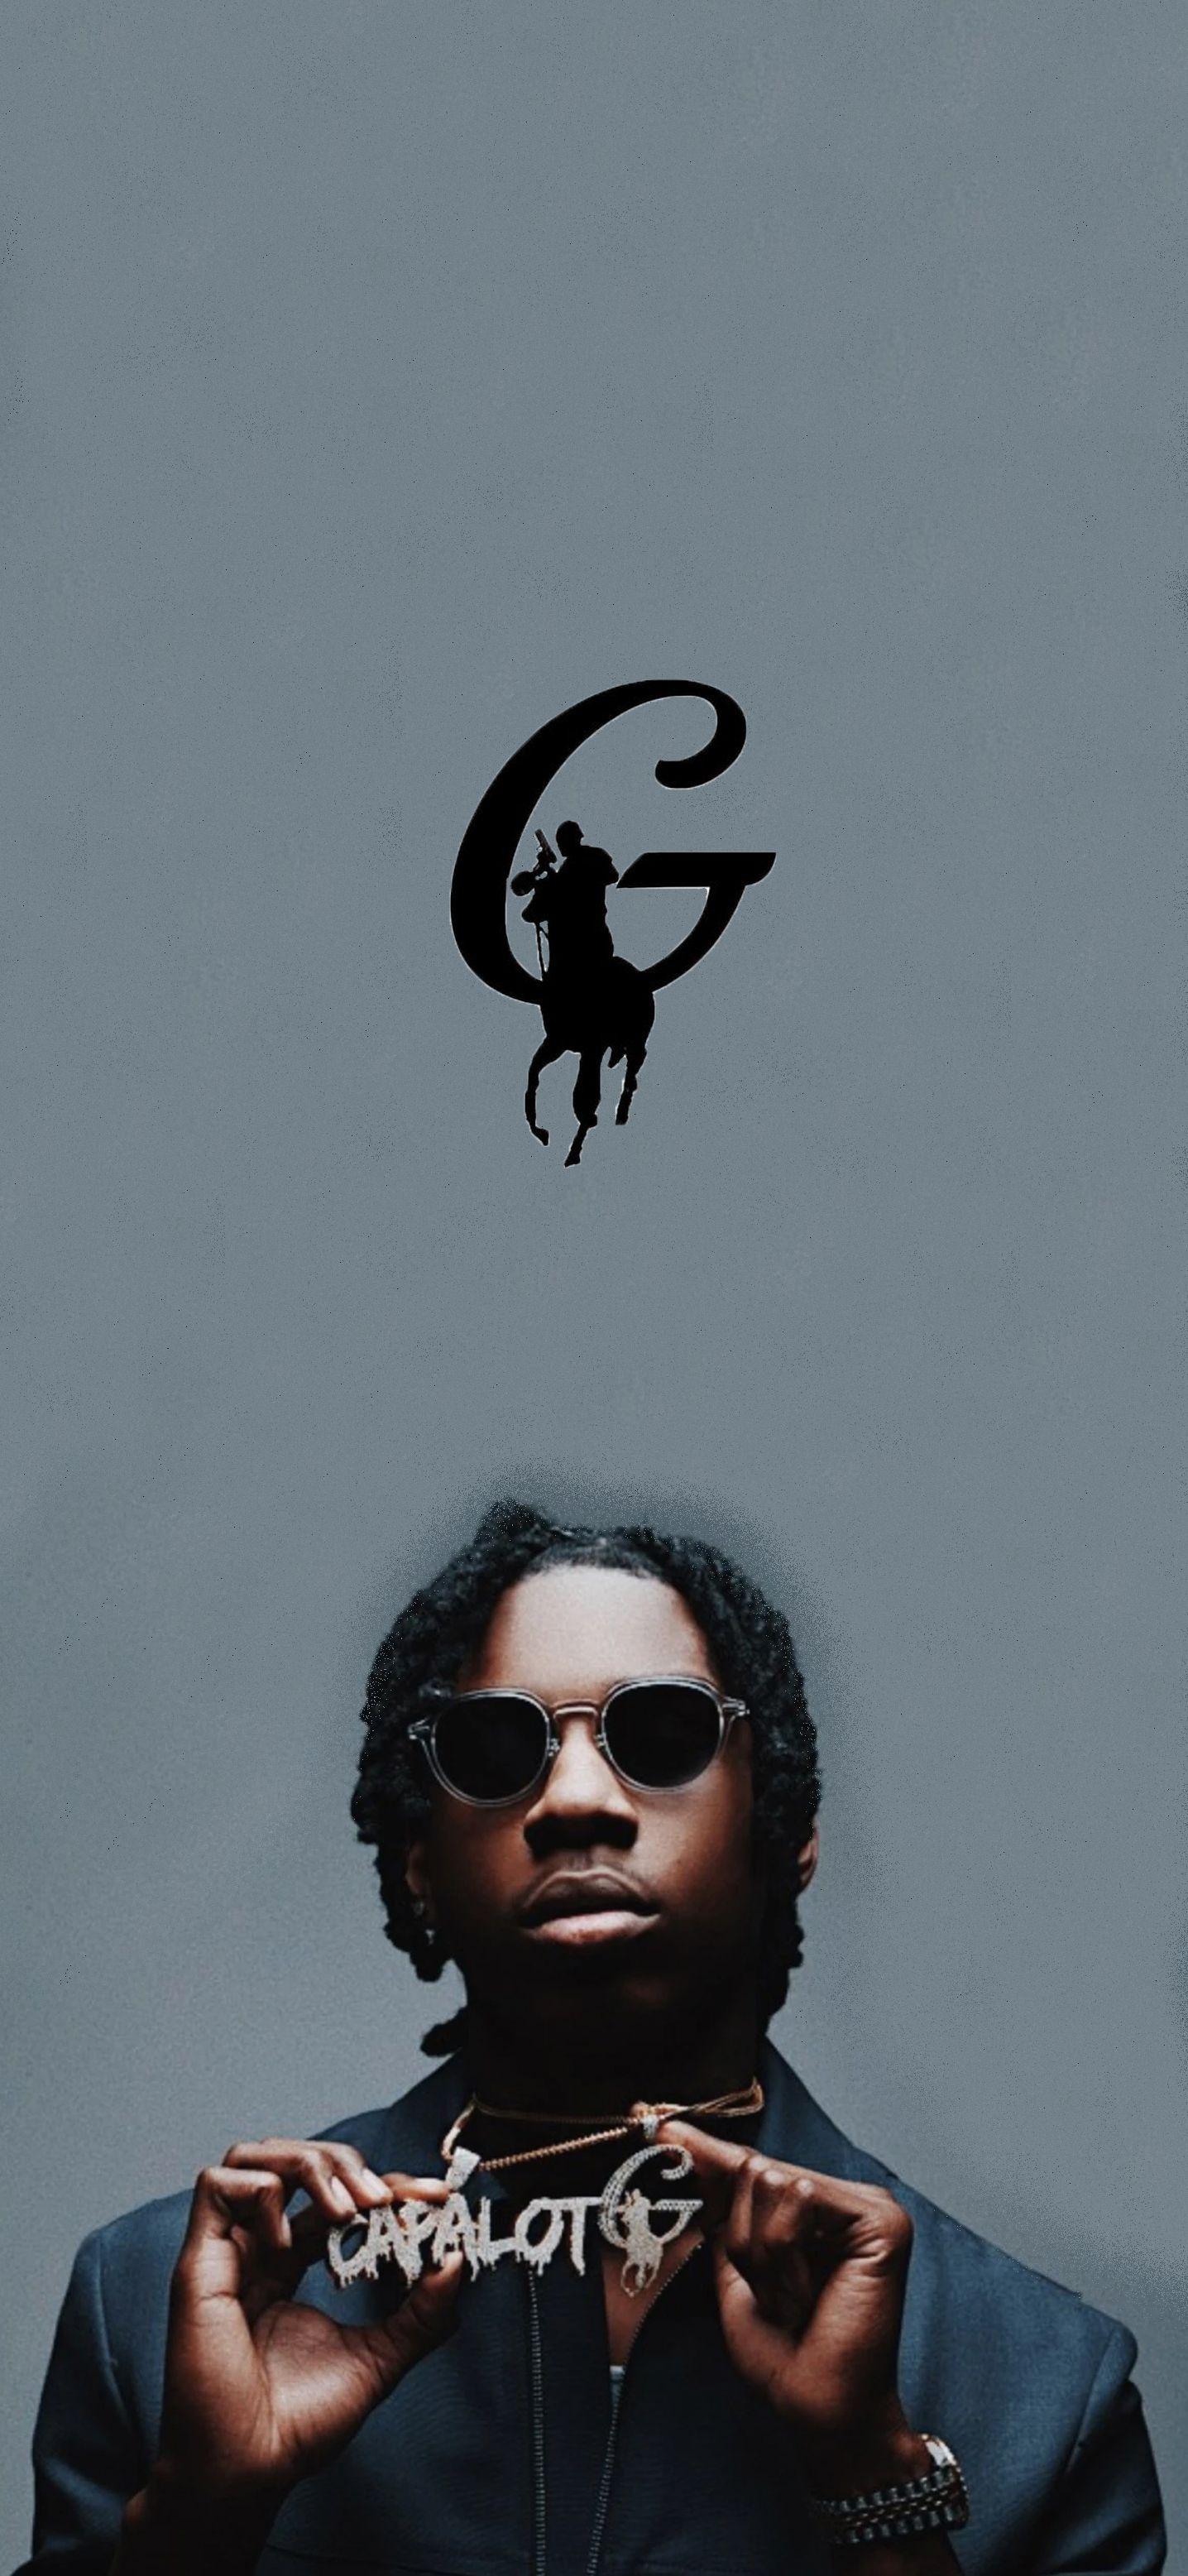 Polo G Wallpaper in 2020 | Rapper wallpaper iphone, Black ...